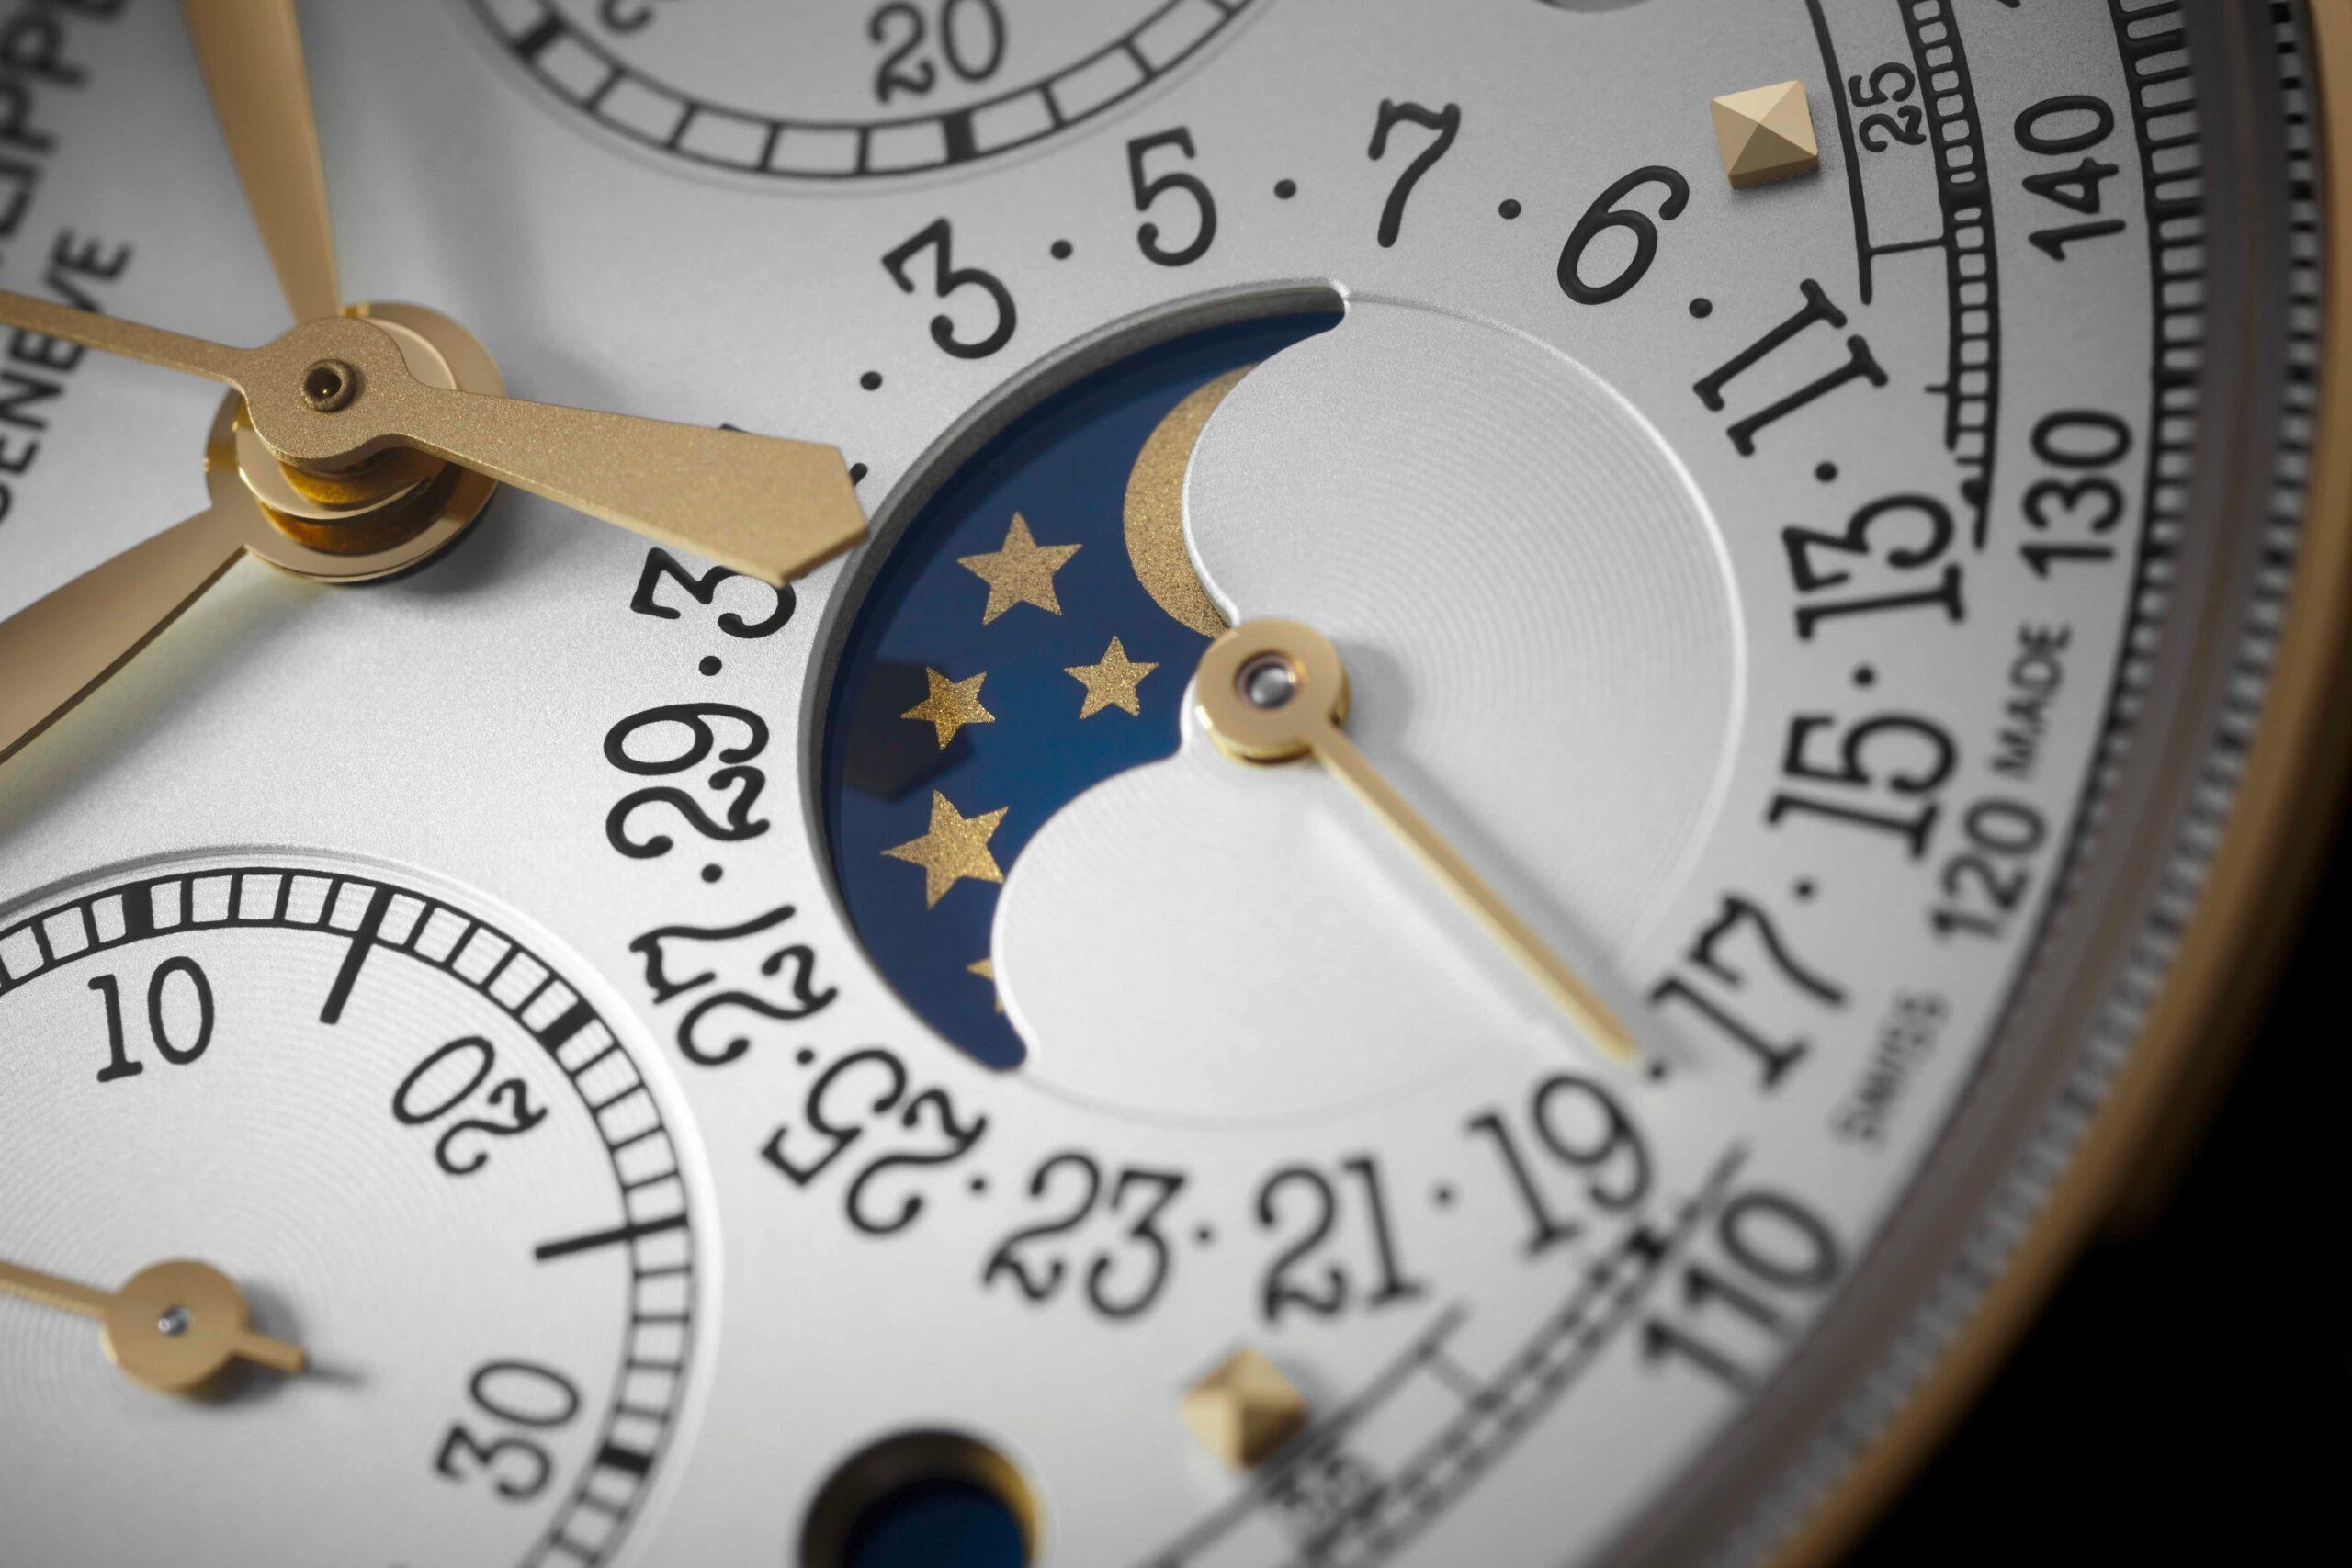 Patek Philippe Perpetual Calendar Chronograph Ref 5270J-001 -moon phase